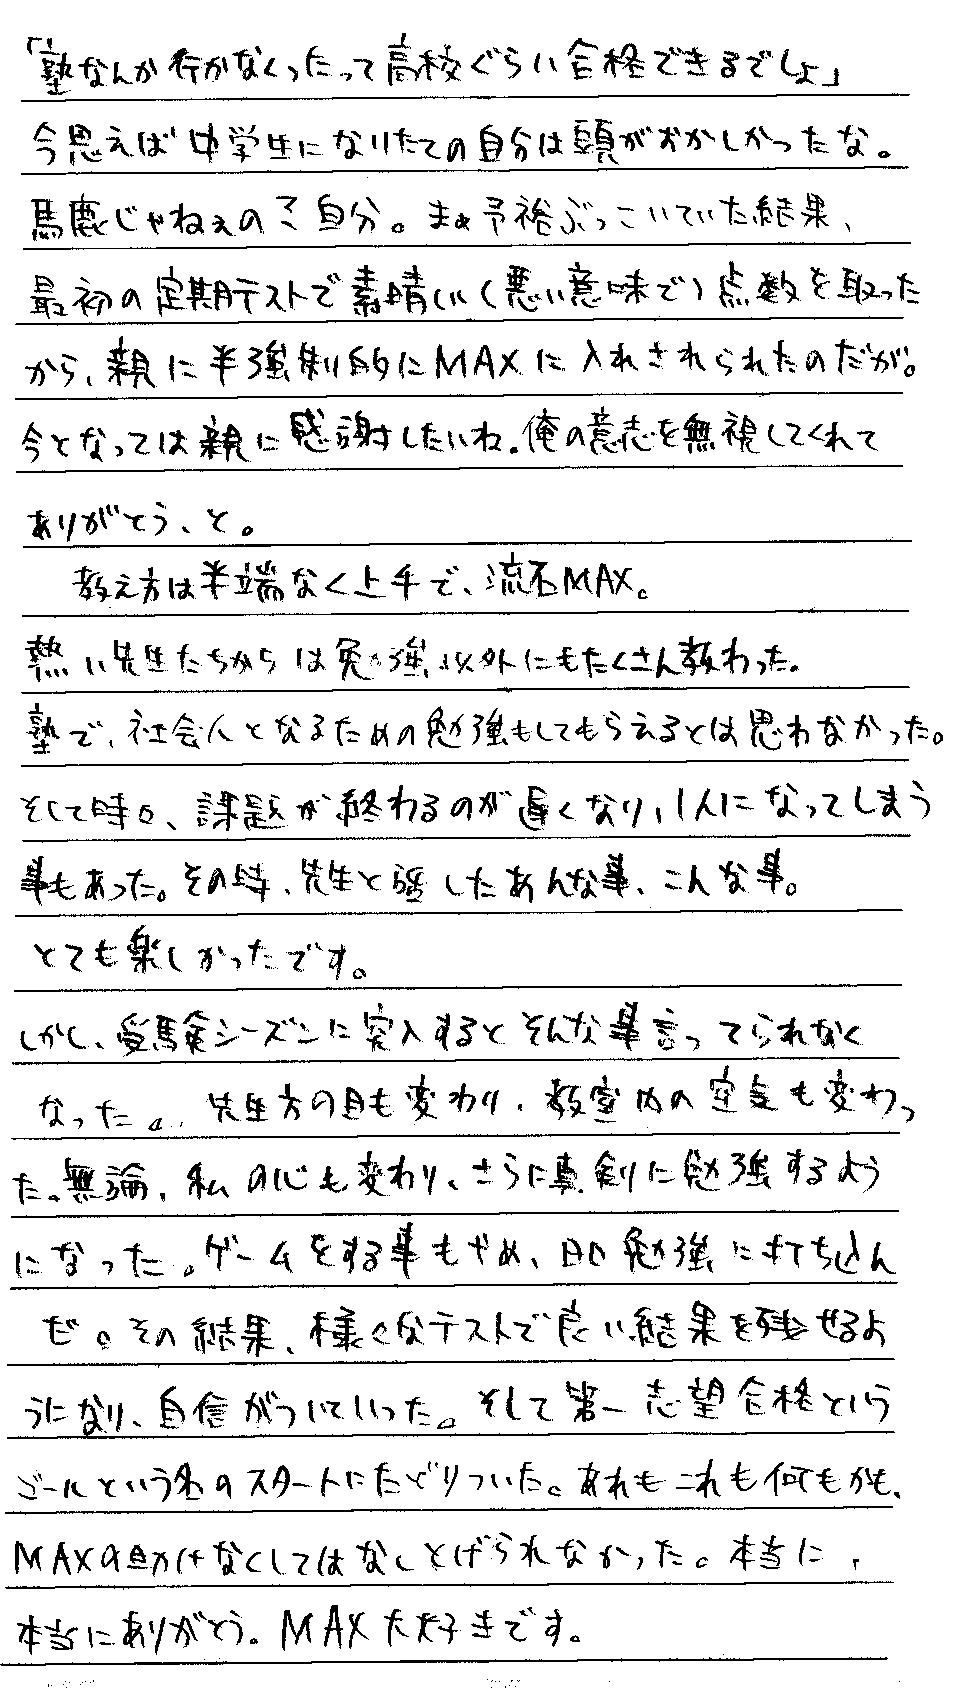 348-1